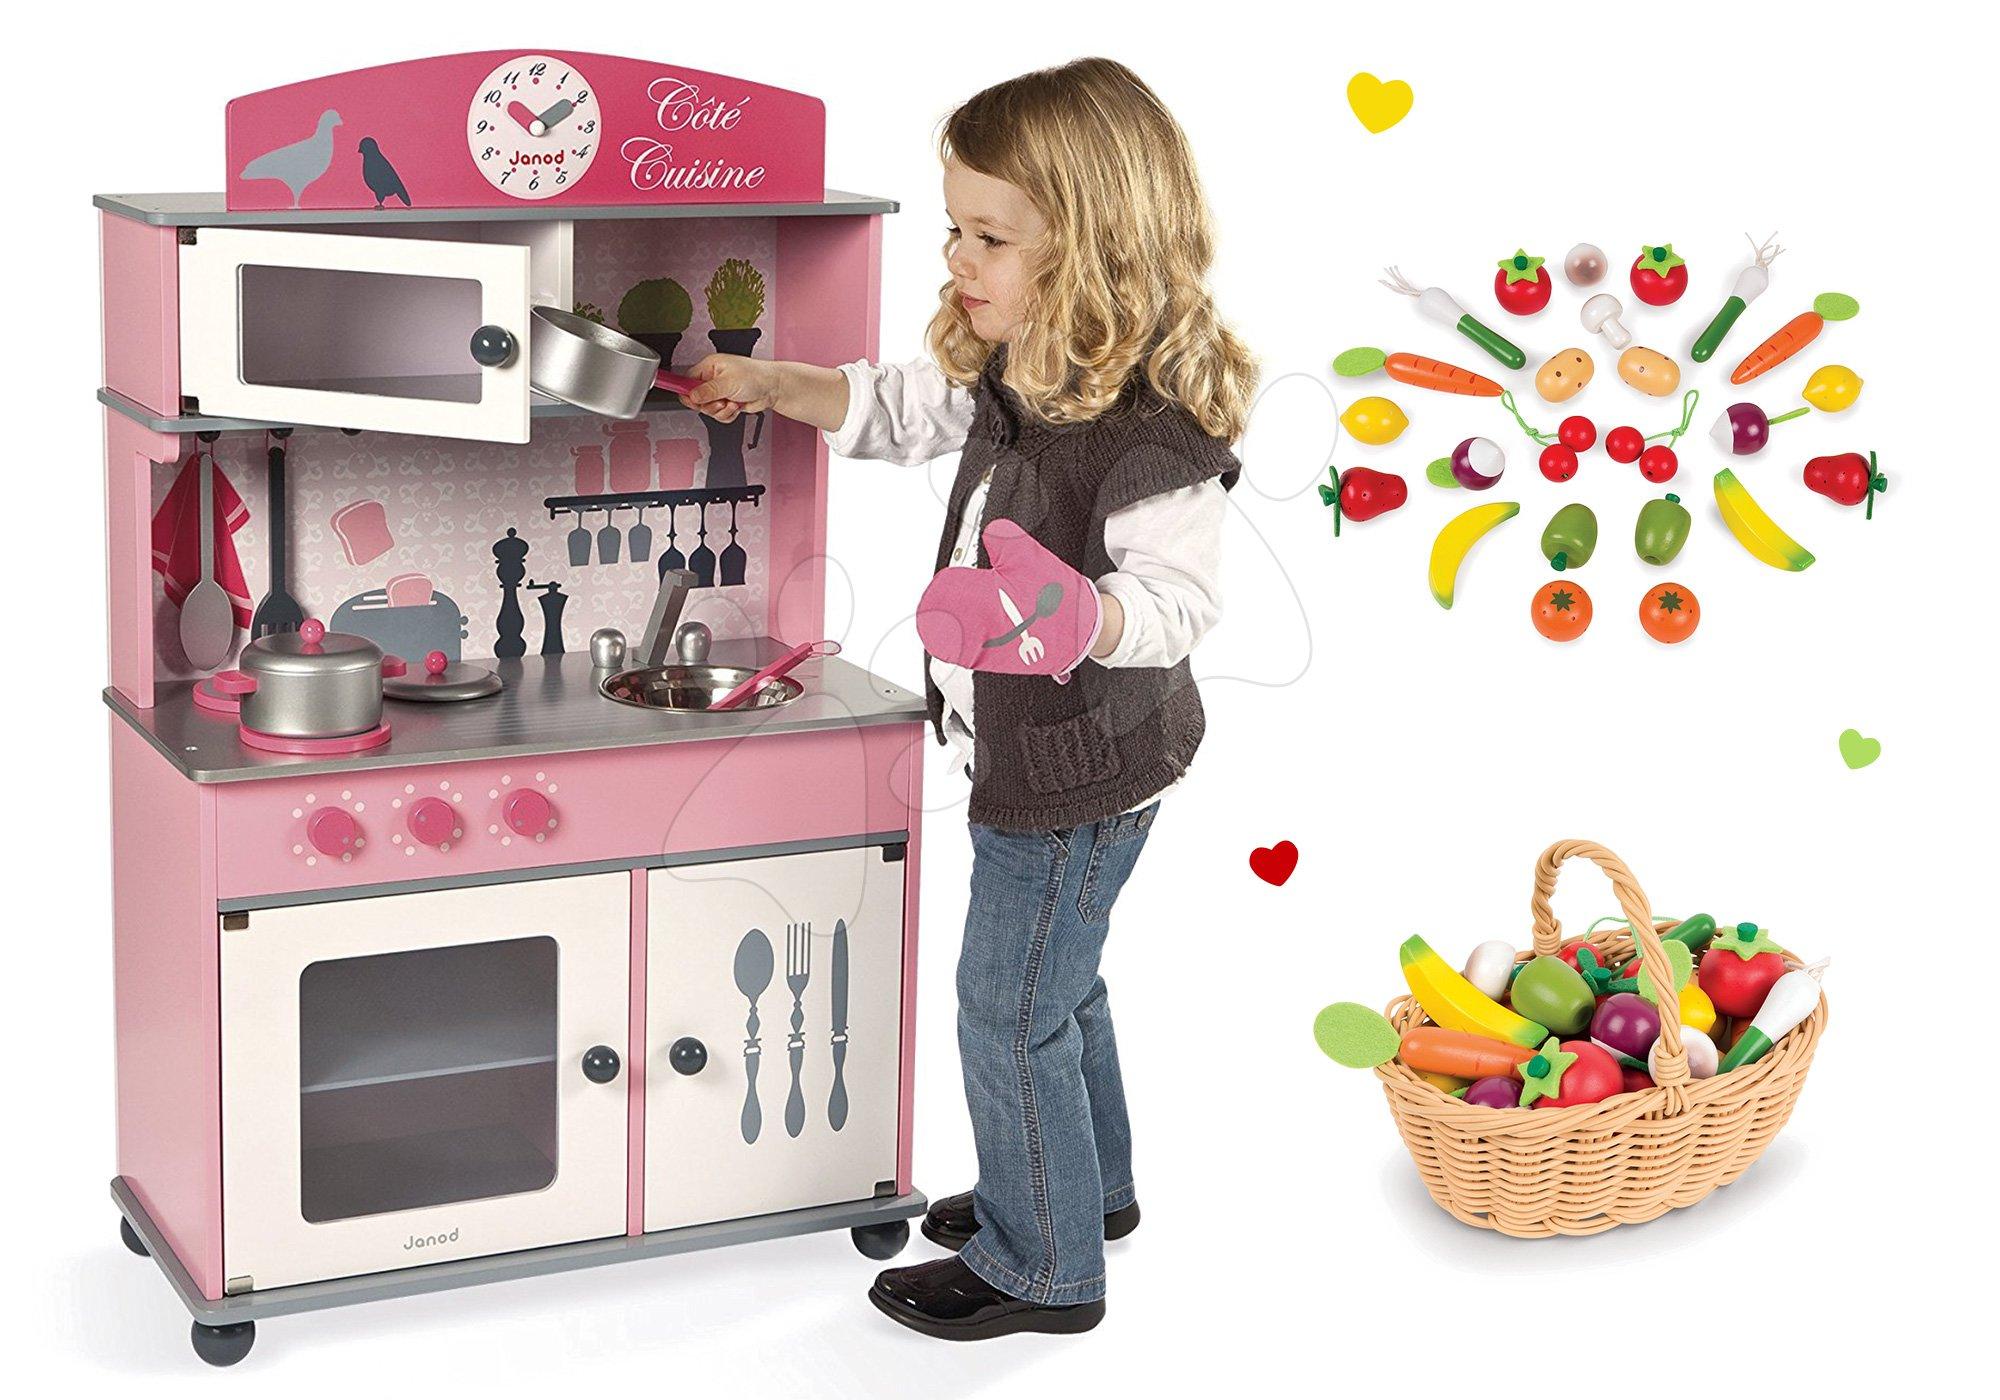 Janod set drevená kuchynka Cote ružová a drevené ovocie a zelenina v košíku 06565-2